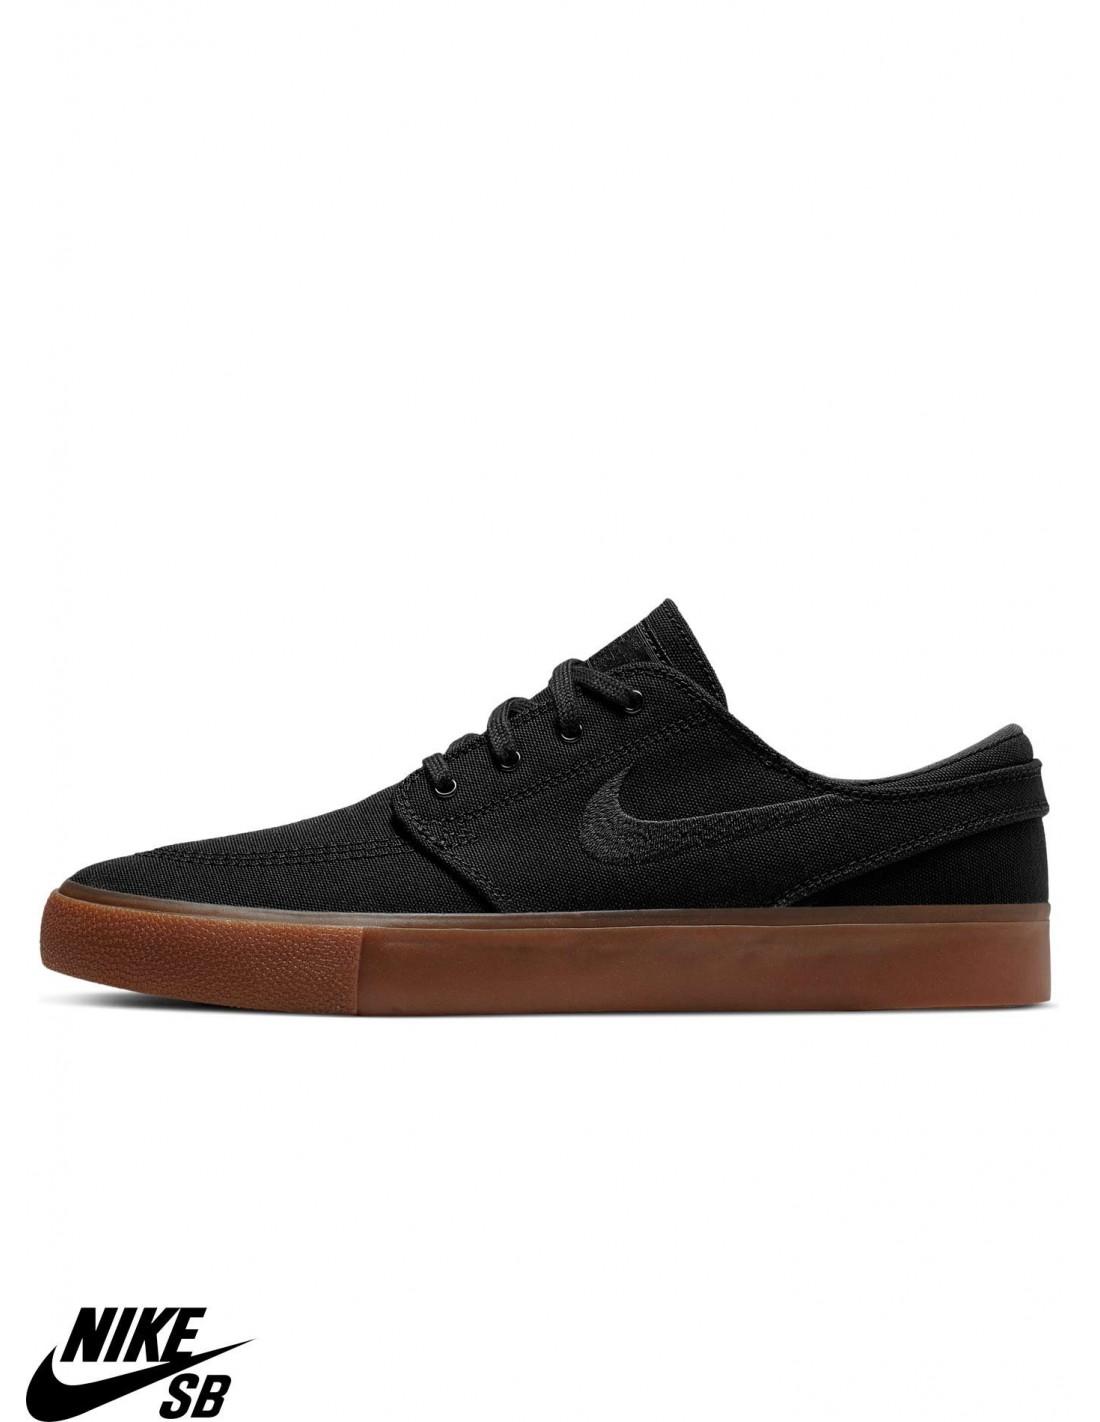 Chaussures Skate Nike SB Zoom Stefan Janoski Canvas RM Black